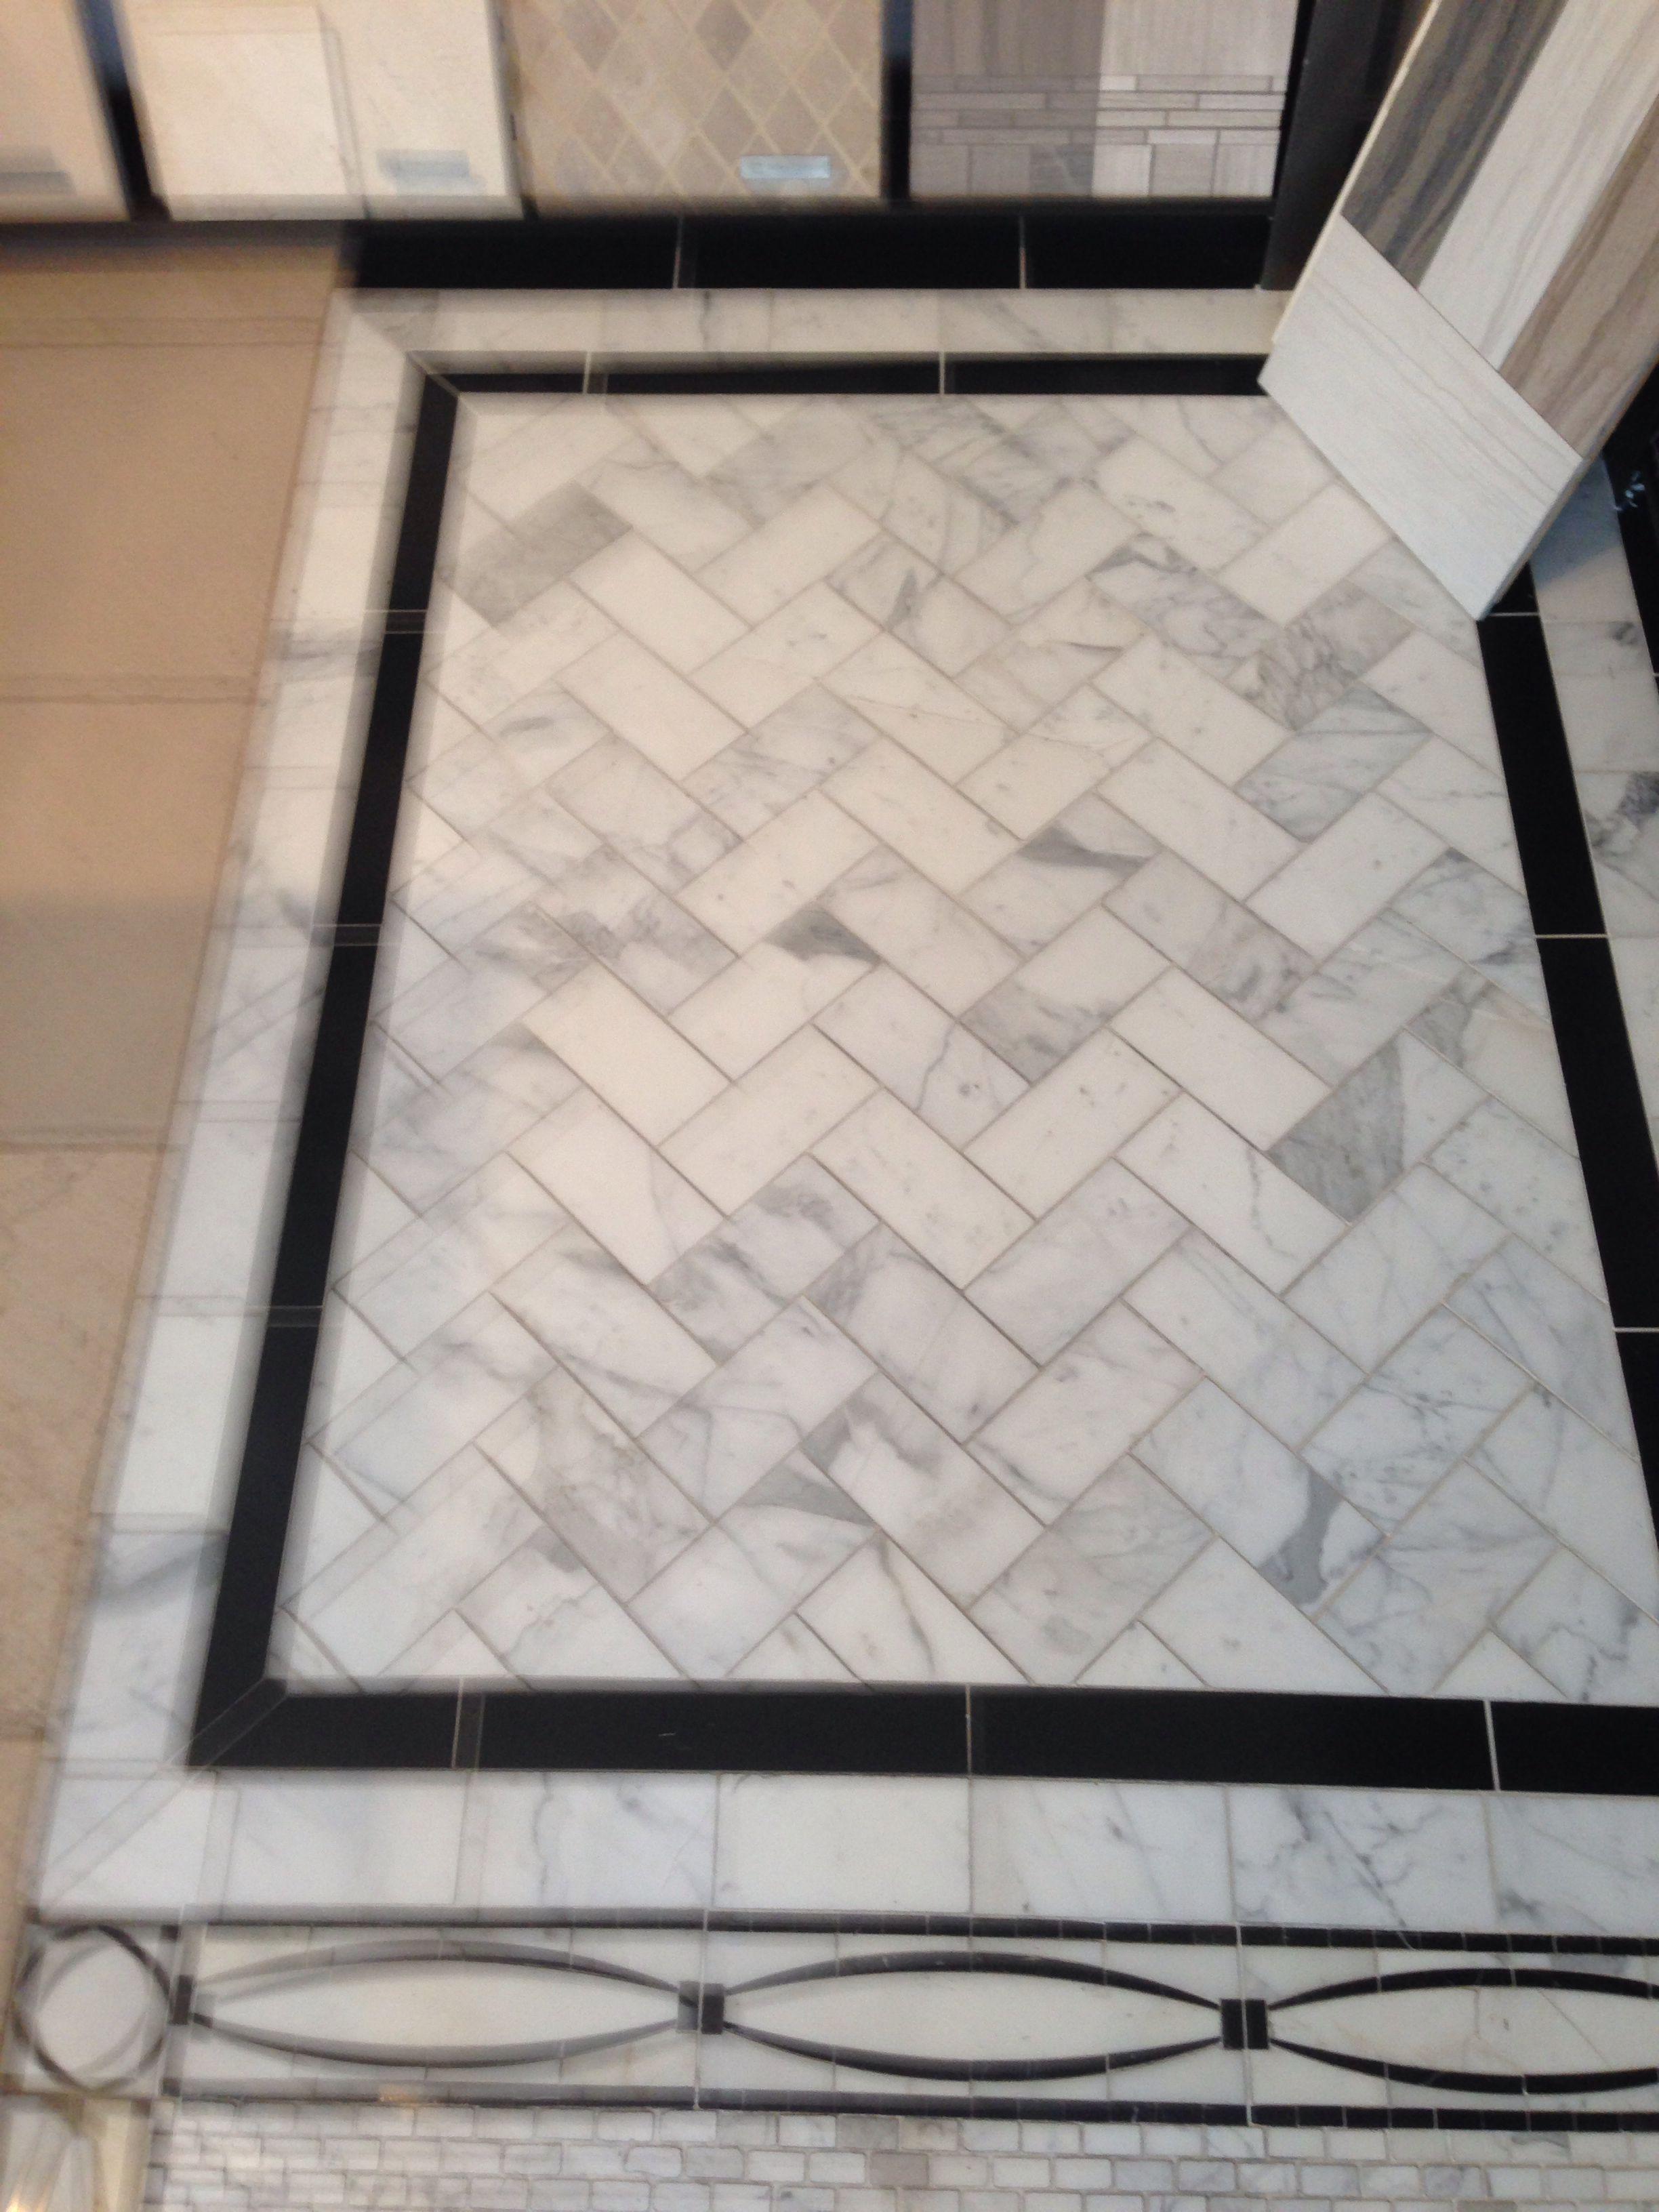 Marble tile floor with black border | Stone/Tile floors in ...